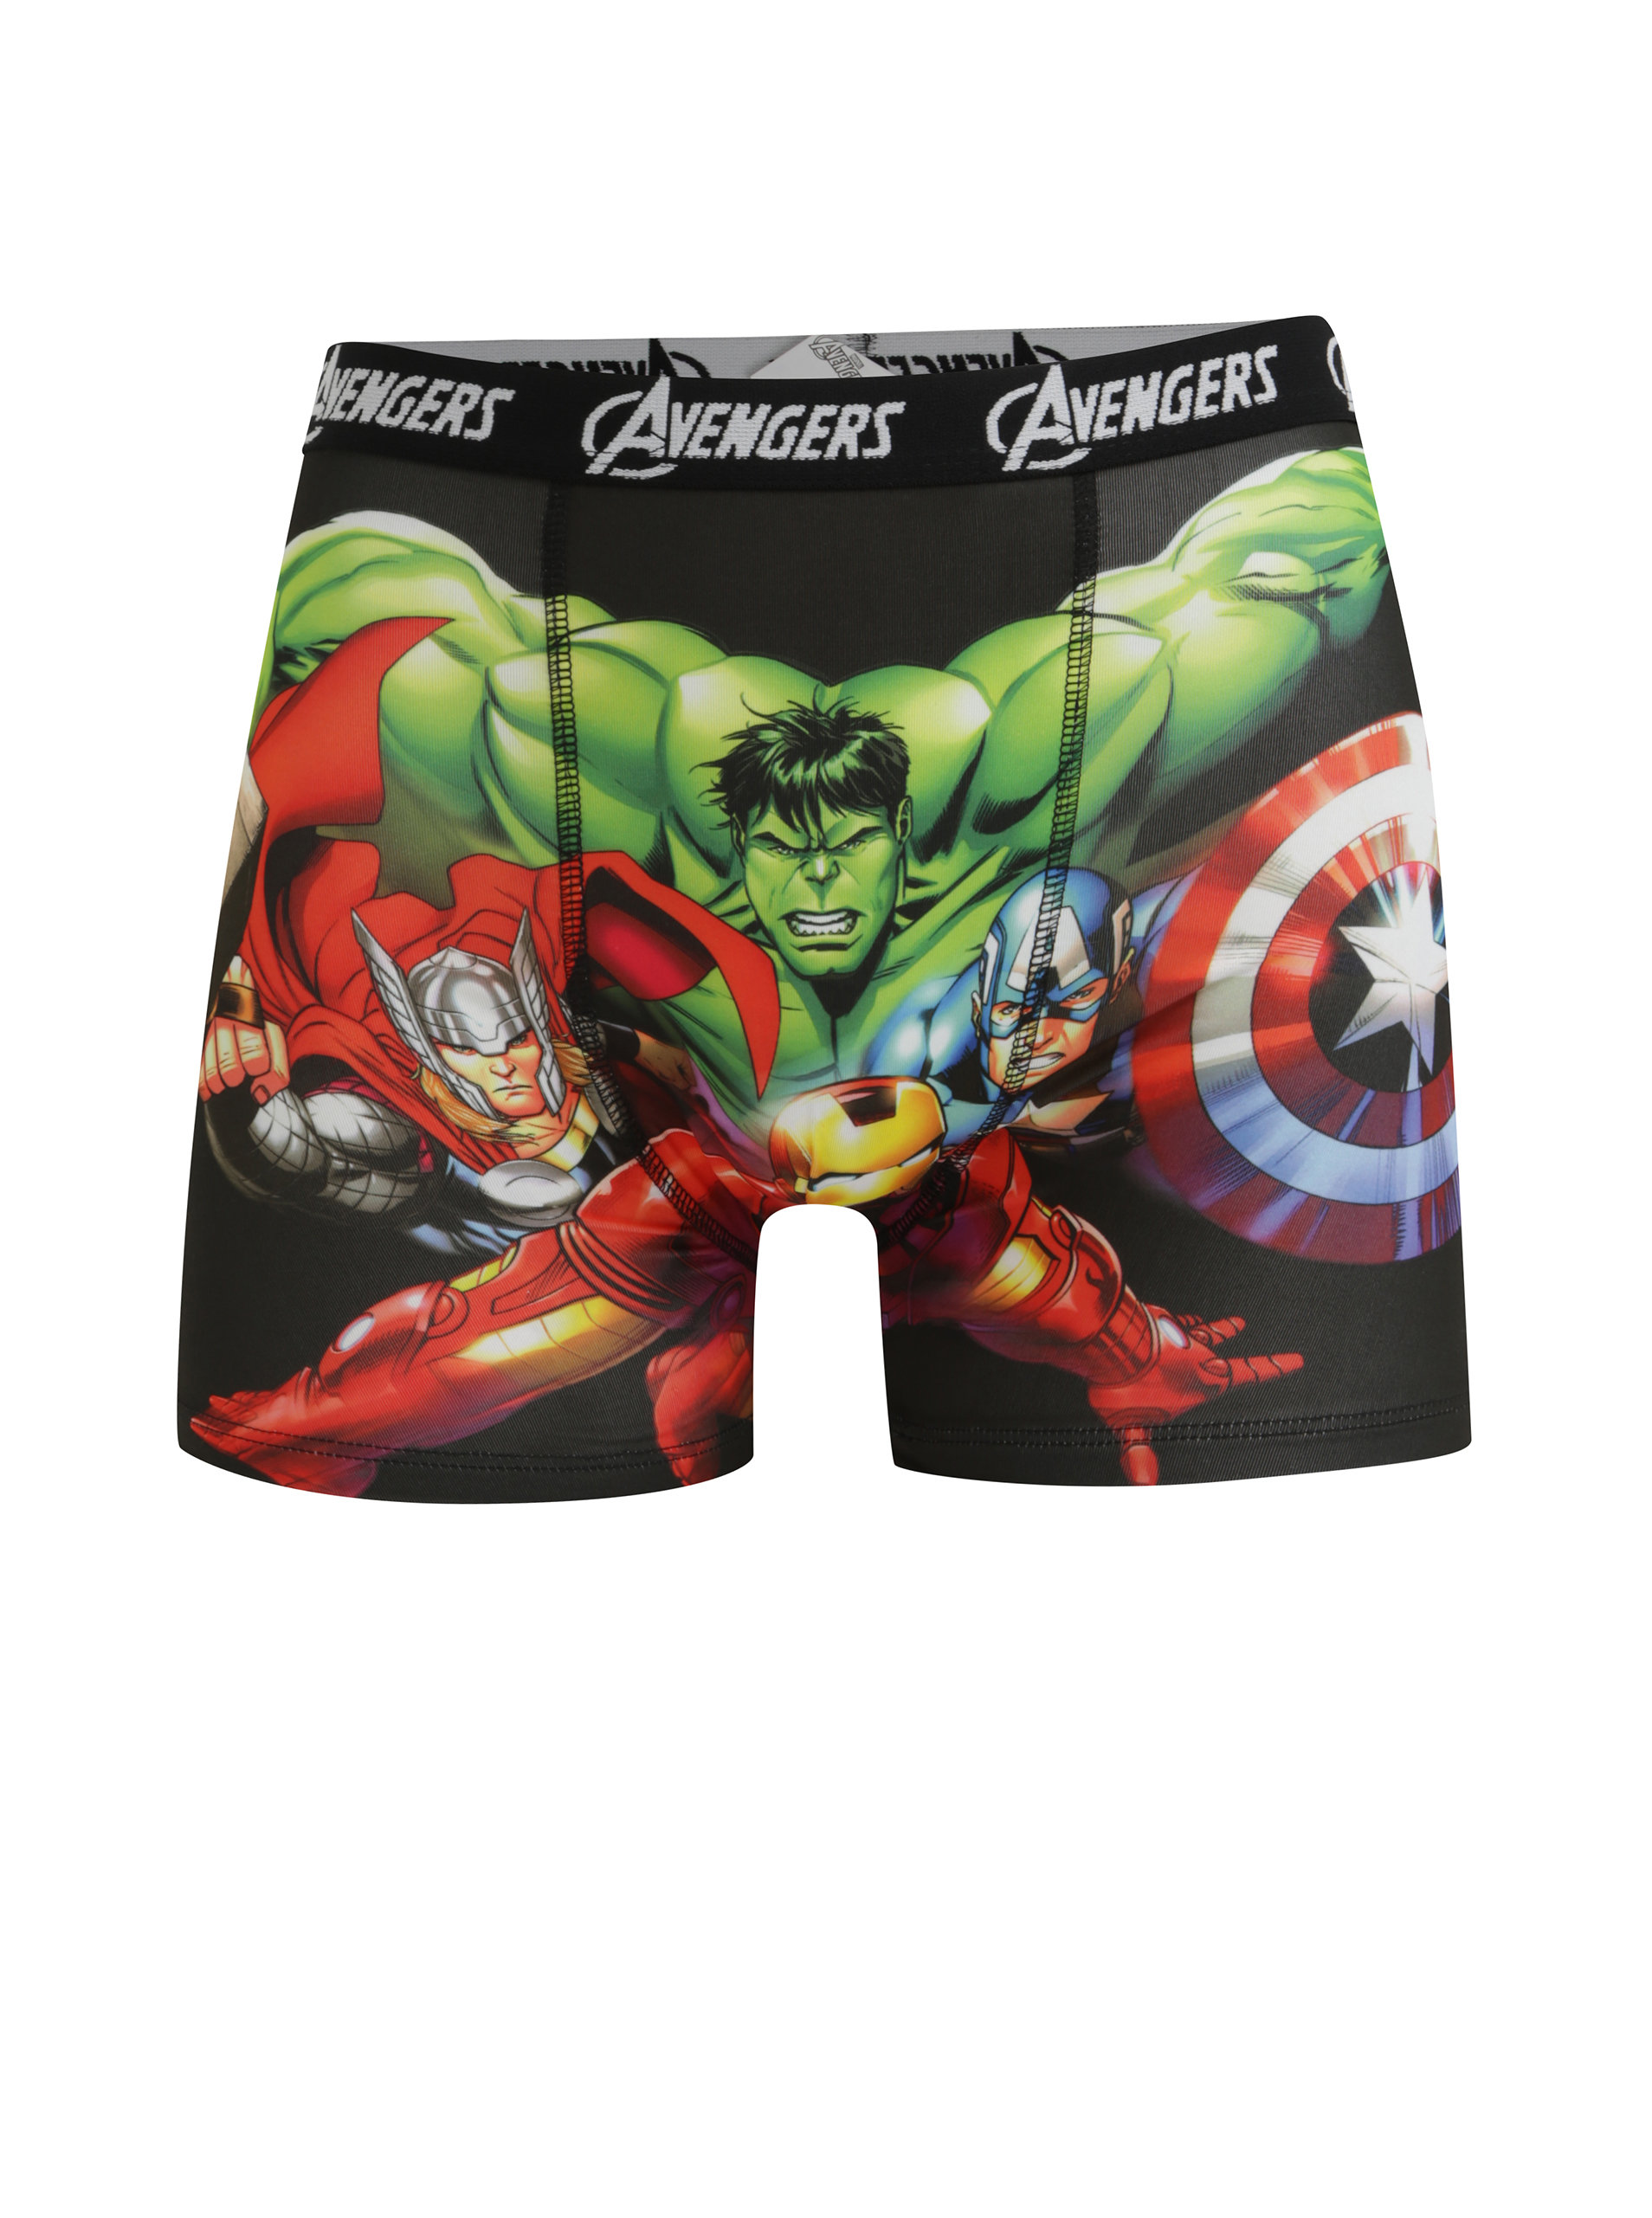 Zeleno-čierne pánske boxerky s potlačou Avengers ... ca1c406ddc0